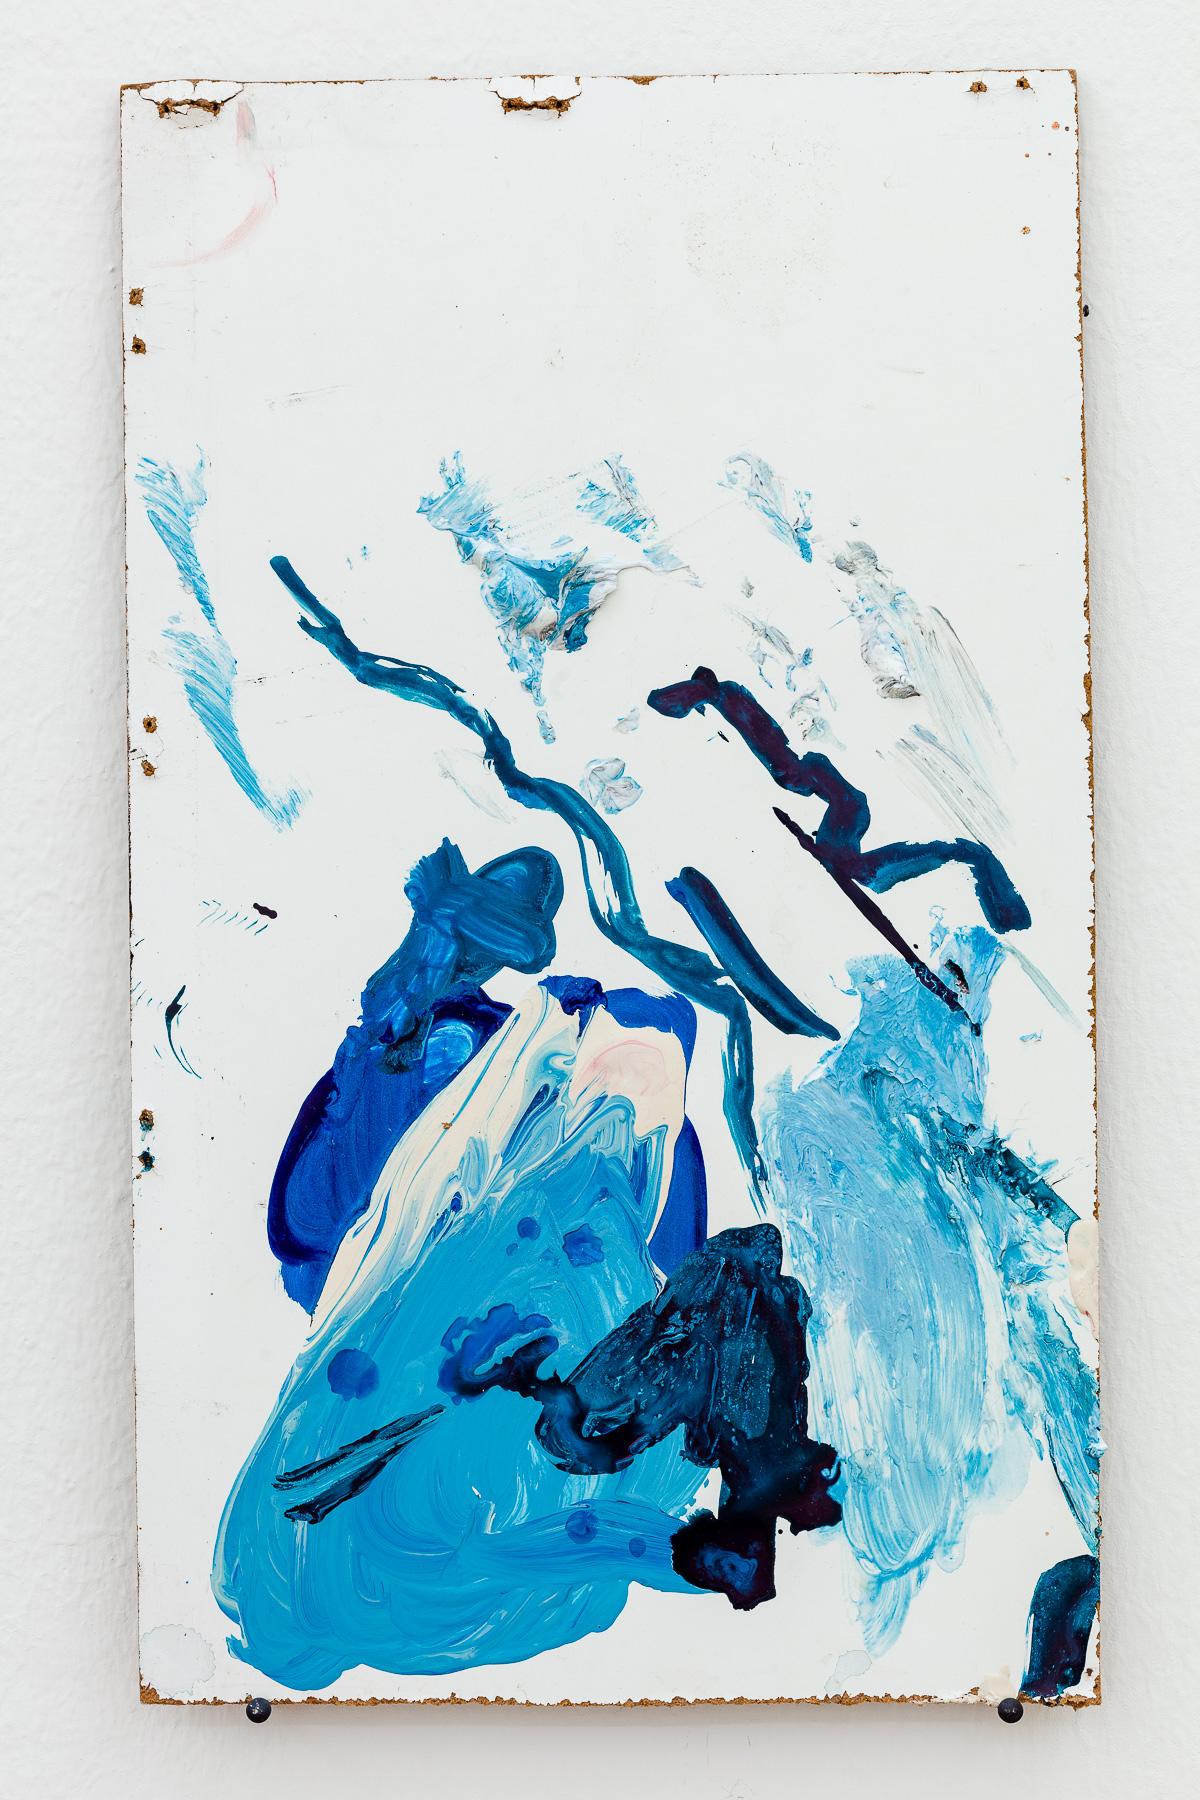 2019_05_20_Elke-Krystufek_Croy-Nielsen_by-kunst-dokumentation-com_017_web.jpg